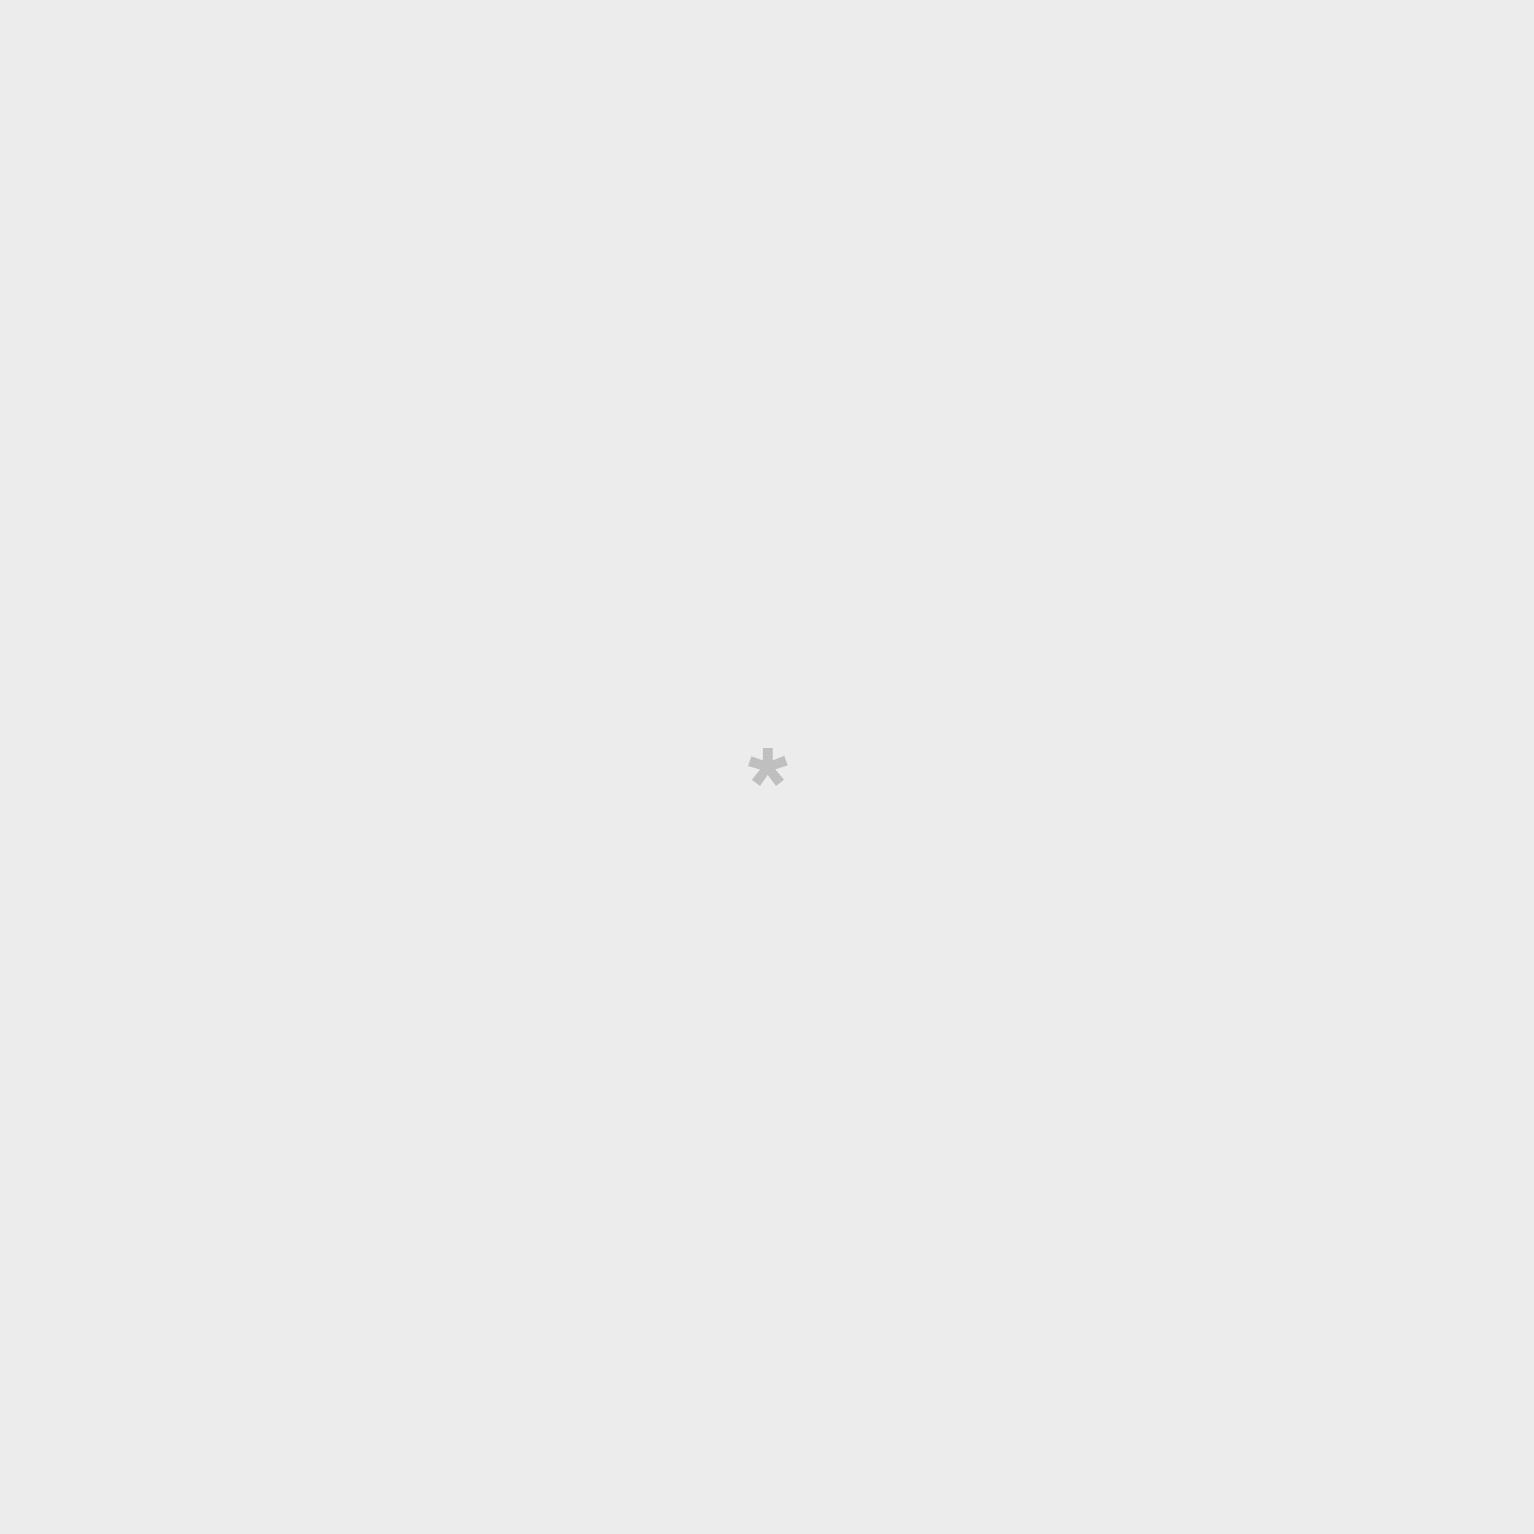 iPhone 12 Pro / iPhone 12 Max MR phone case - Cupcakes